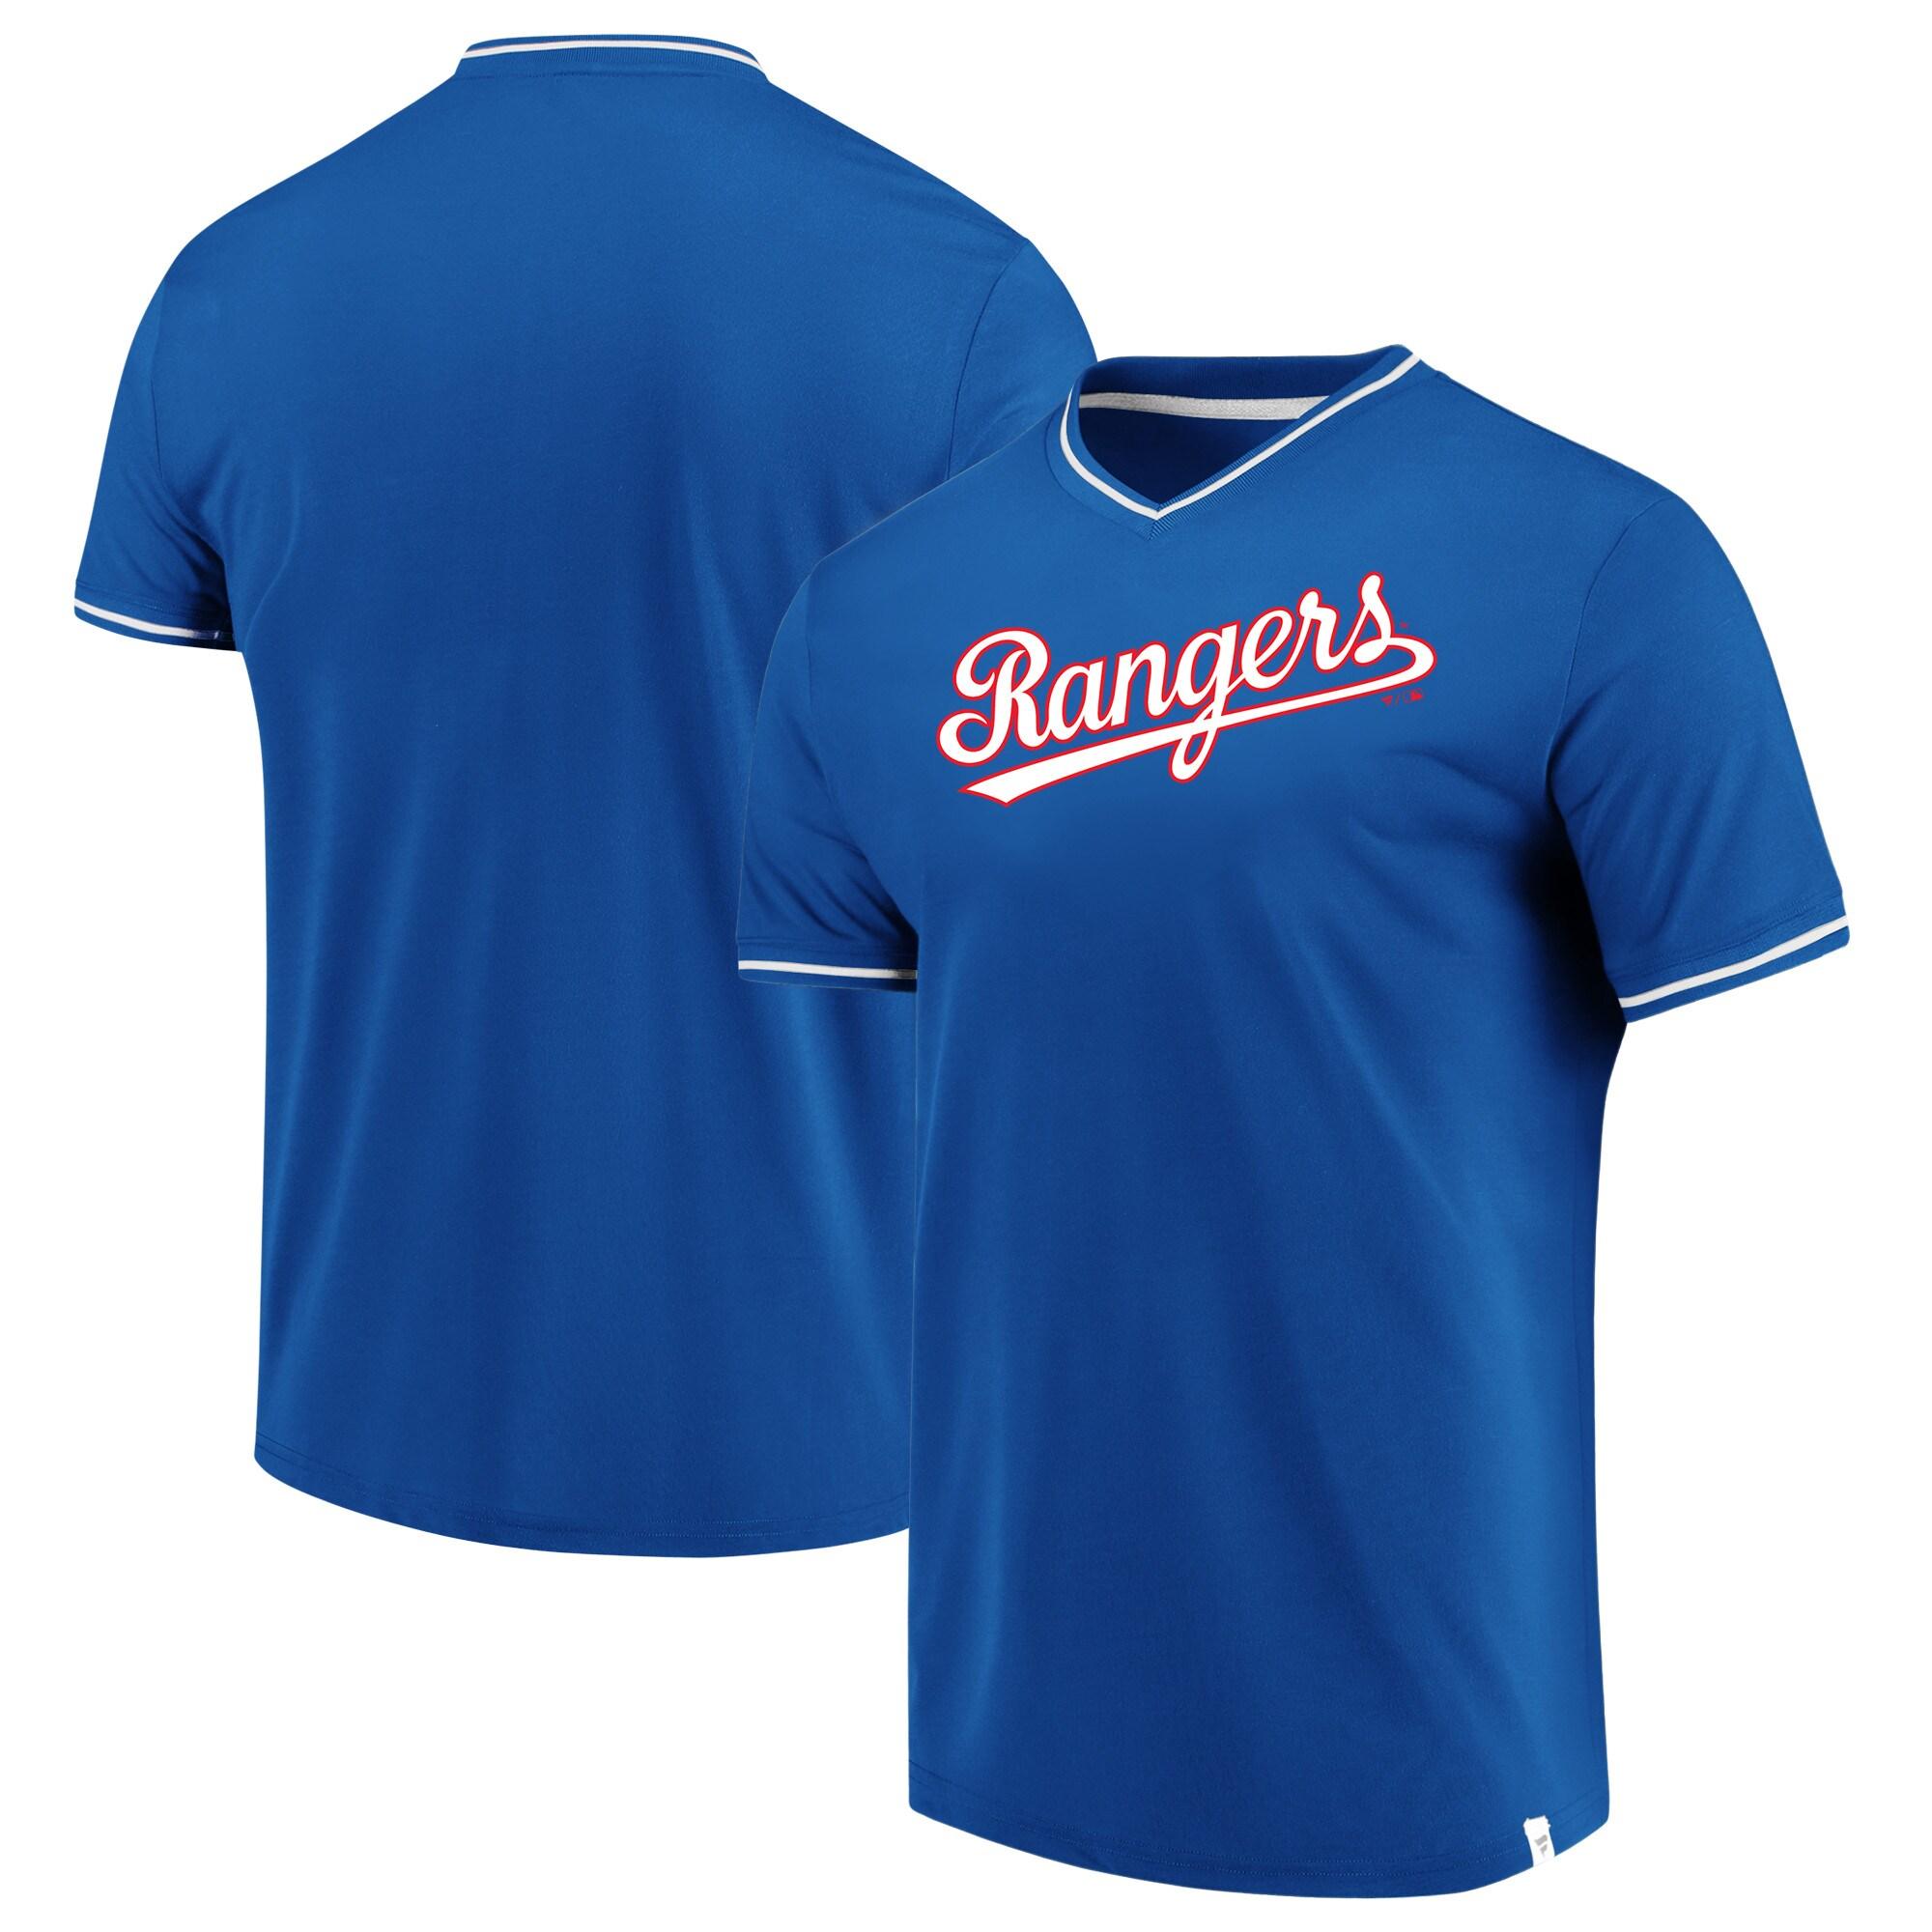 Texas Rangers Fanatics Branded True Classics V-Neck T-Shirt - Royal/White